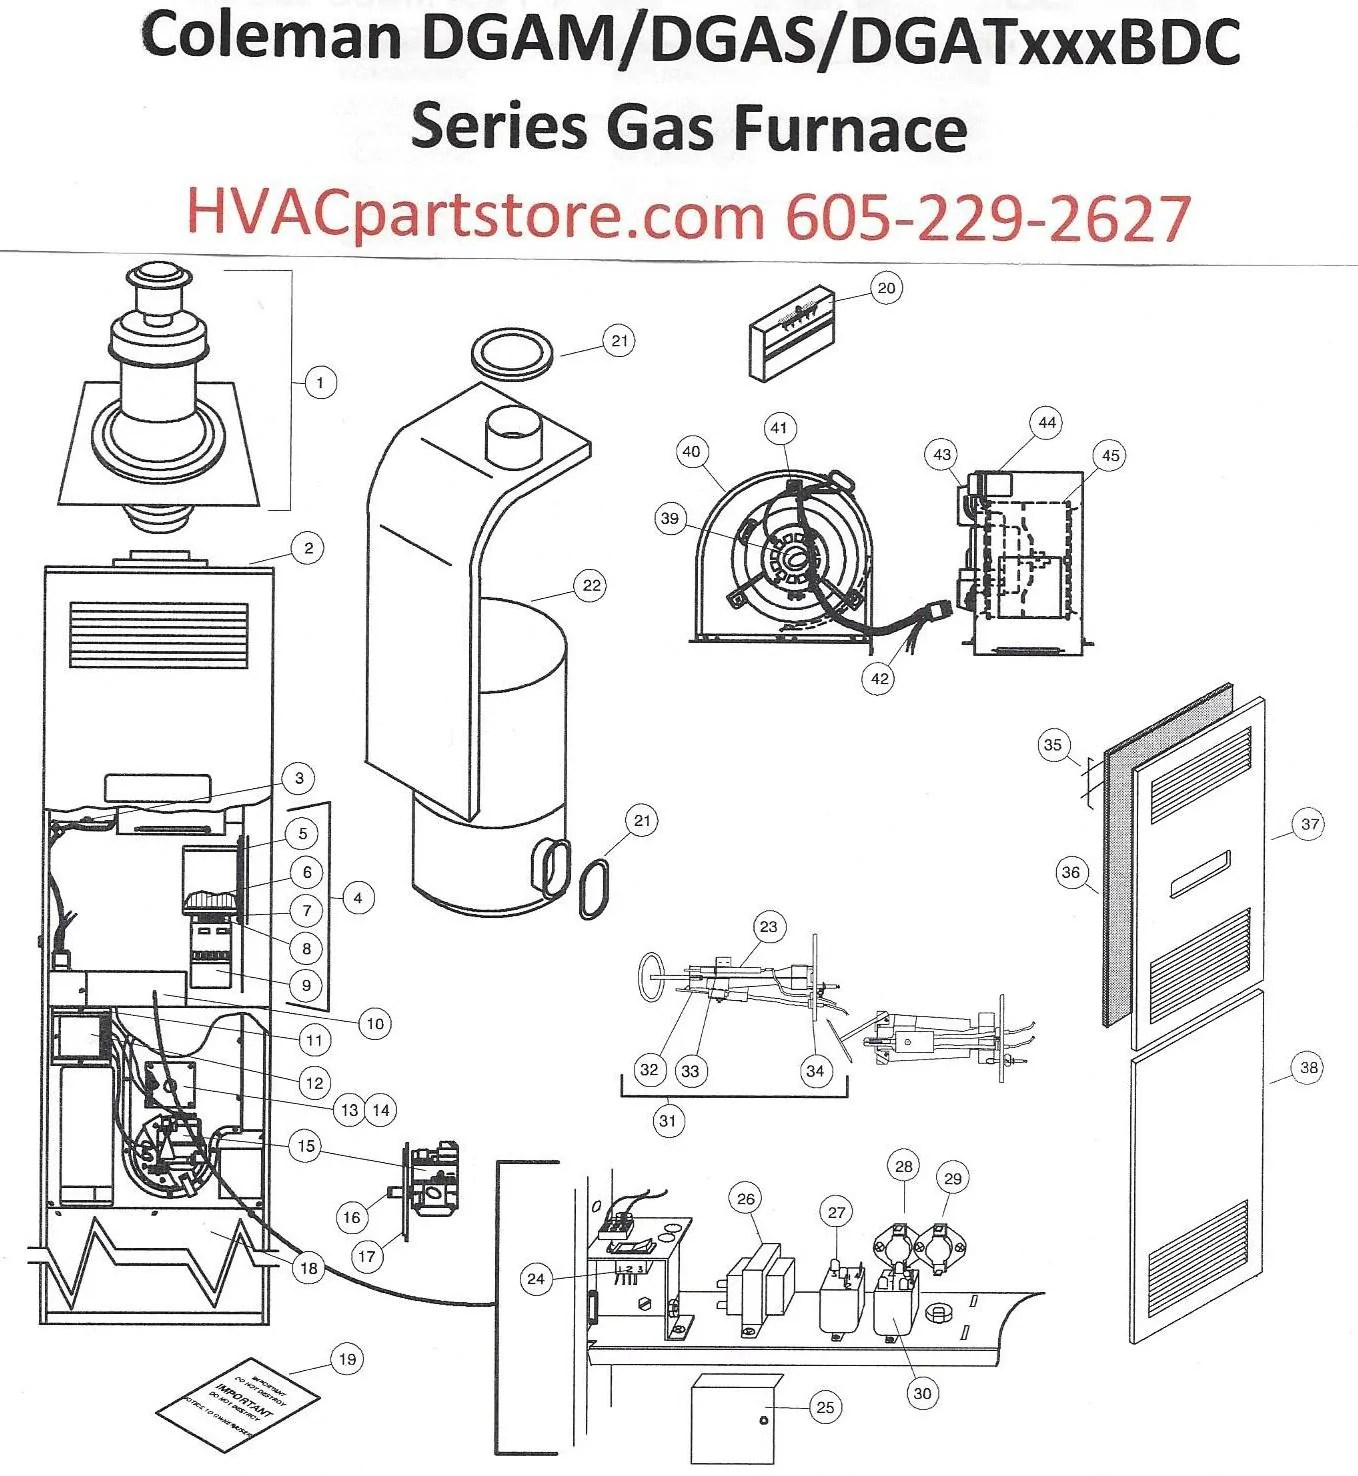 evcon dgat070bdd furnace wiring diagram